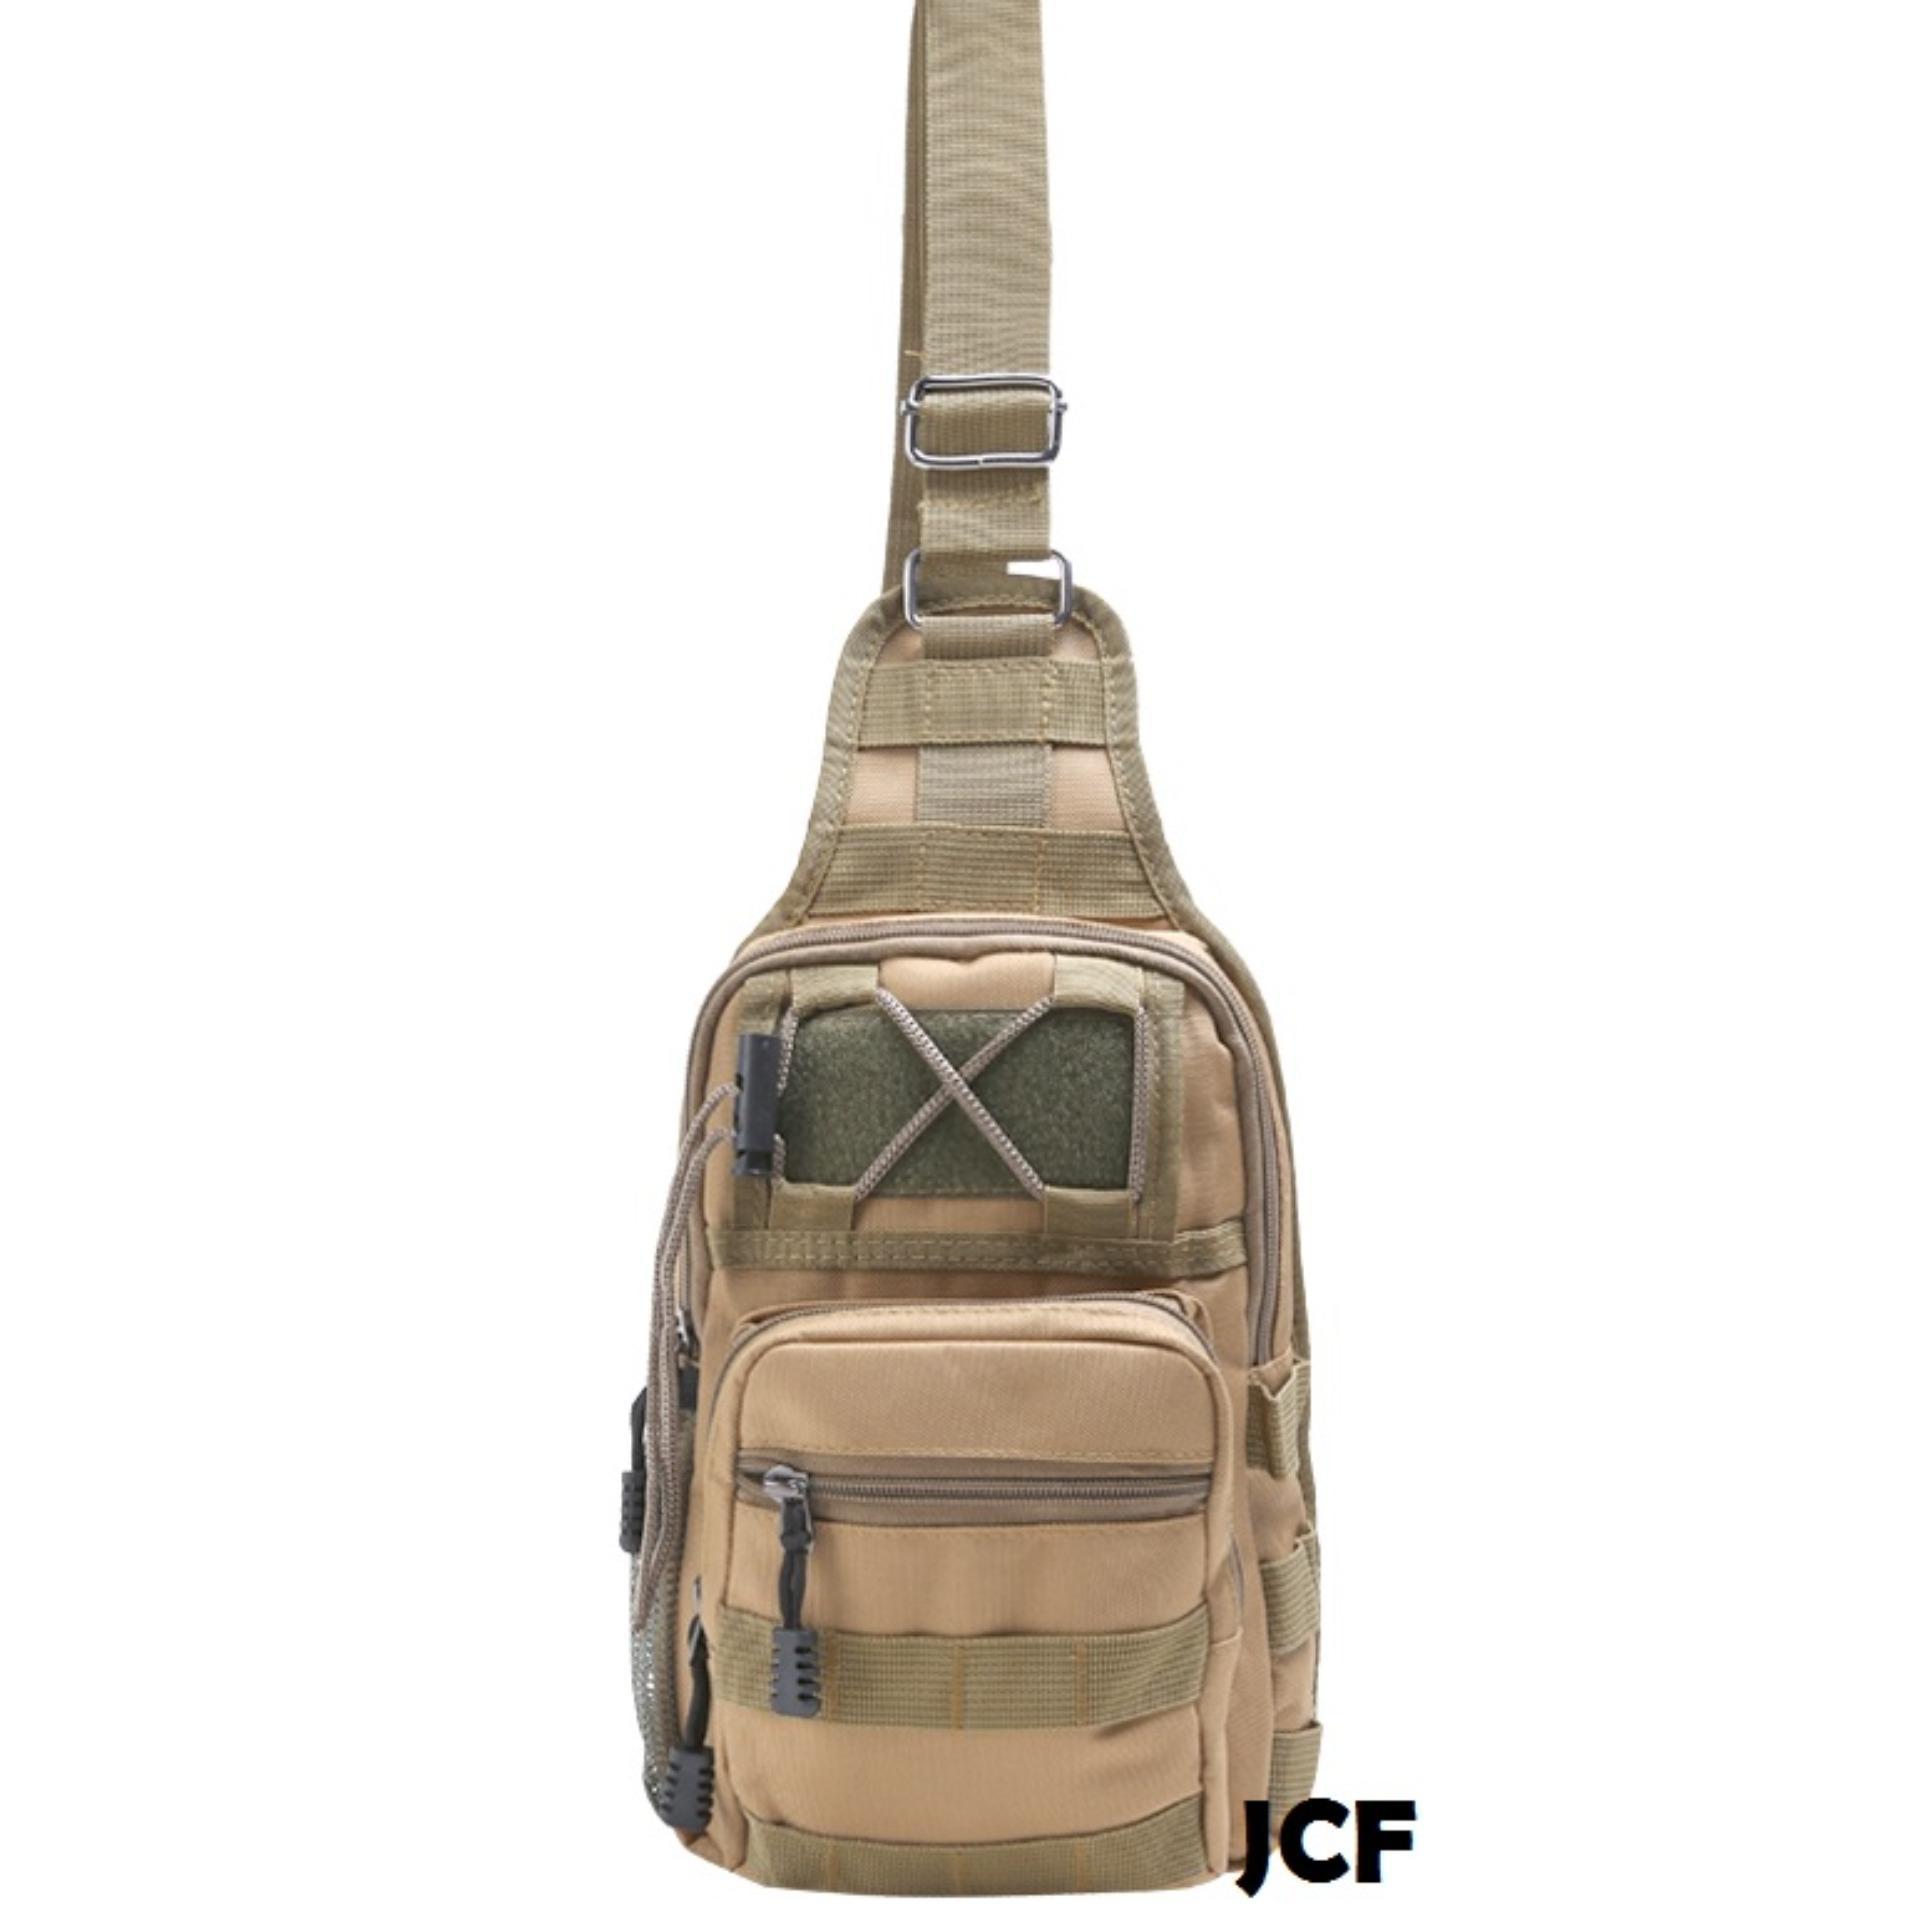 Cek Harga Baru Jcf Tas Slempang Import Cowok Pria Army Tactical Sling Waist Messenger Shoulder Bag Backpack Khaki